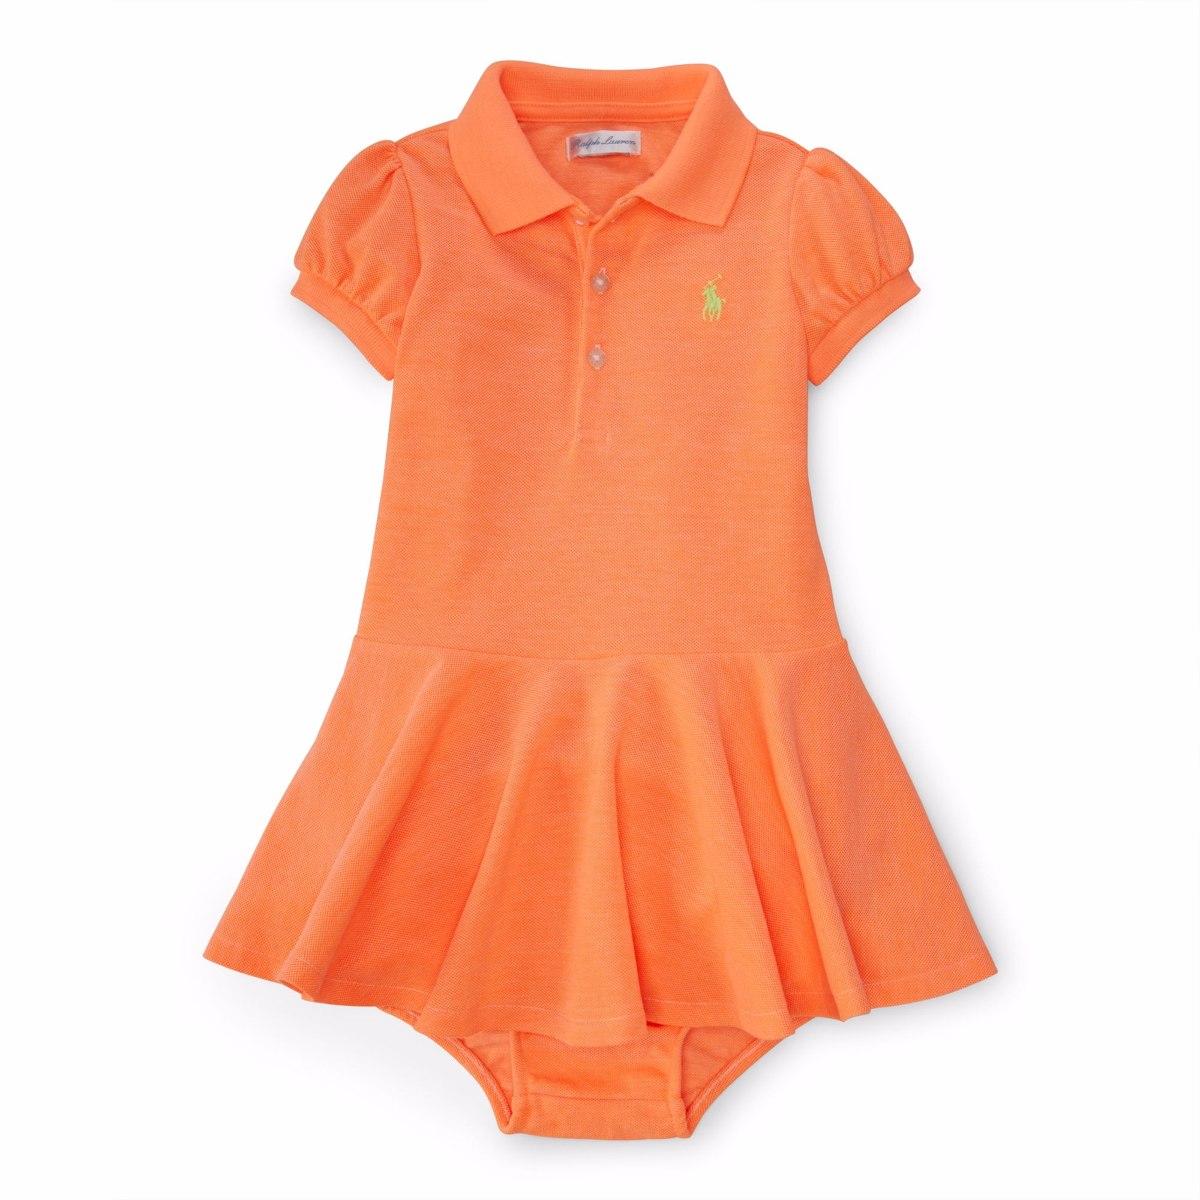 c21a9720f8 roupas de bebe vestido polo rl polo mangas curtas laranja. Carregando zoom.